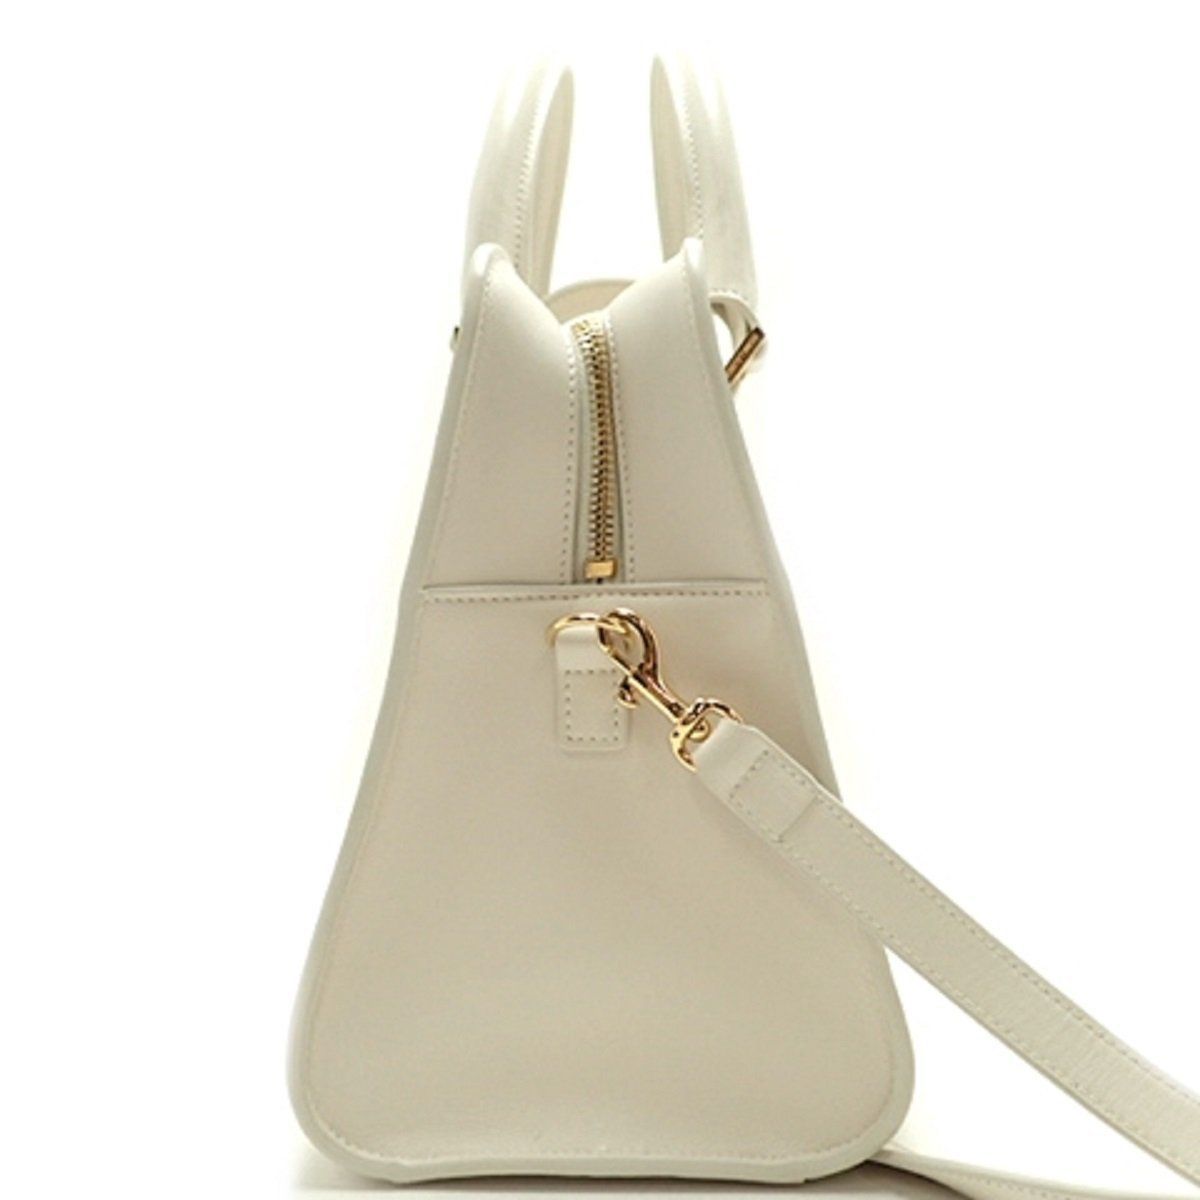 3994e0b4eeb67 Saint Laurent YSL Women's White Cabas Satchel Handbag 472469 ...